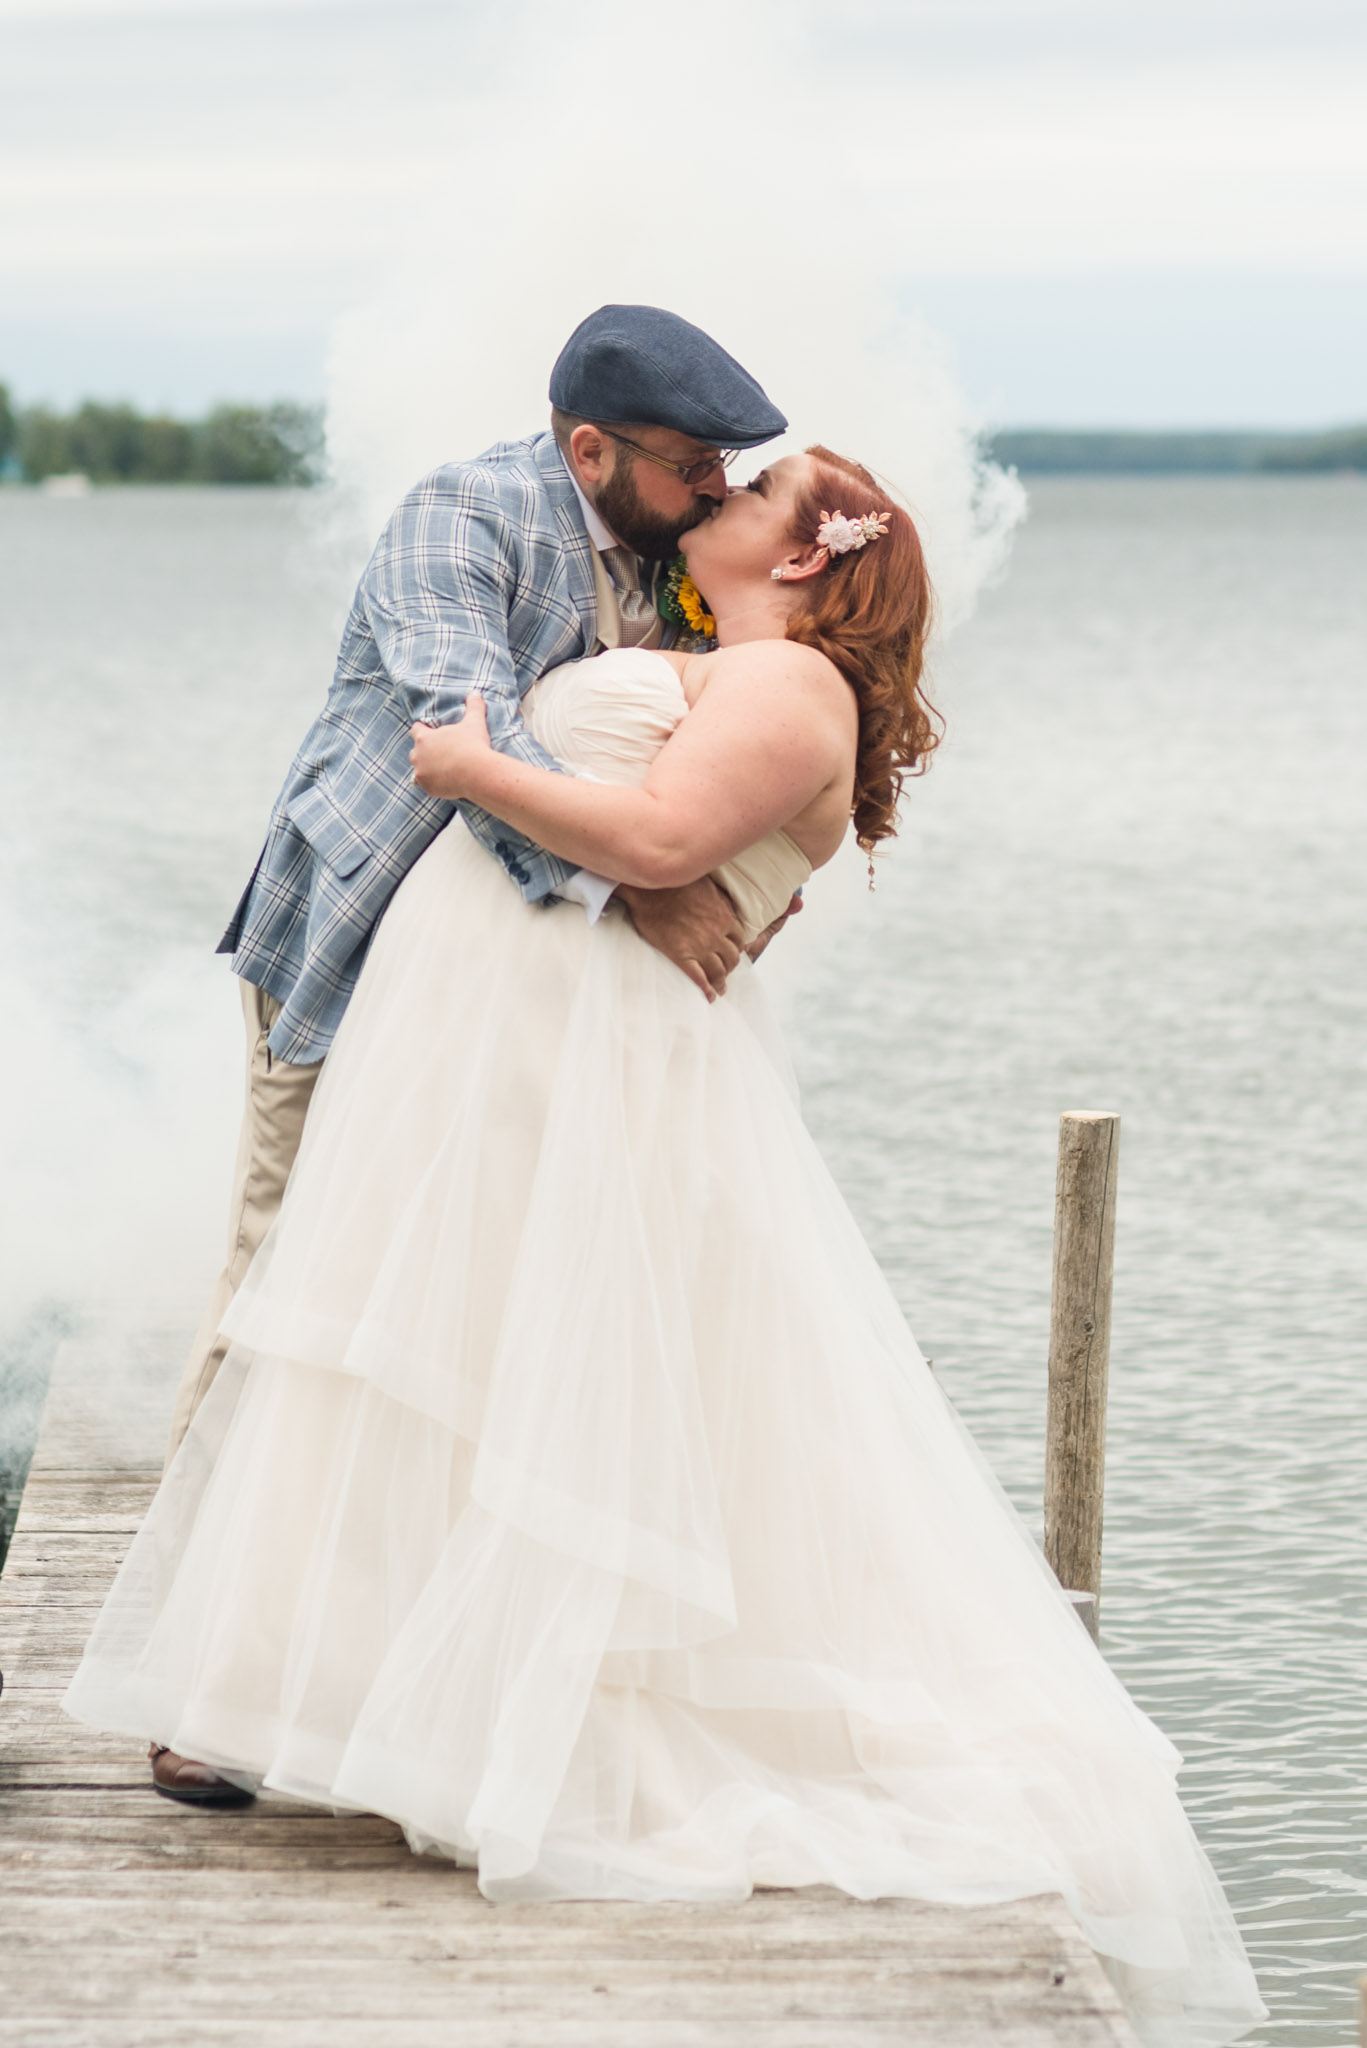 wedding smoke bomb pictures